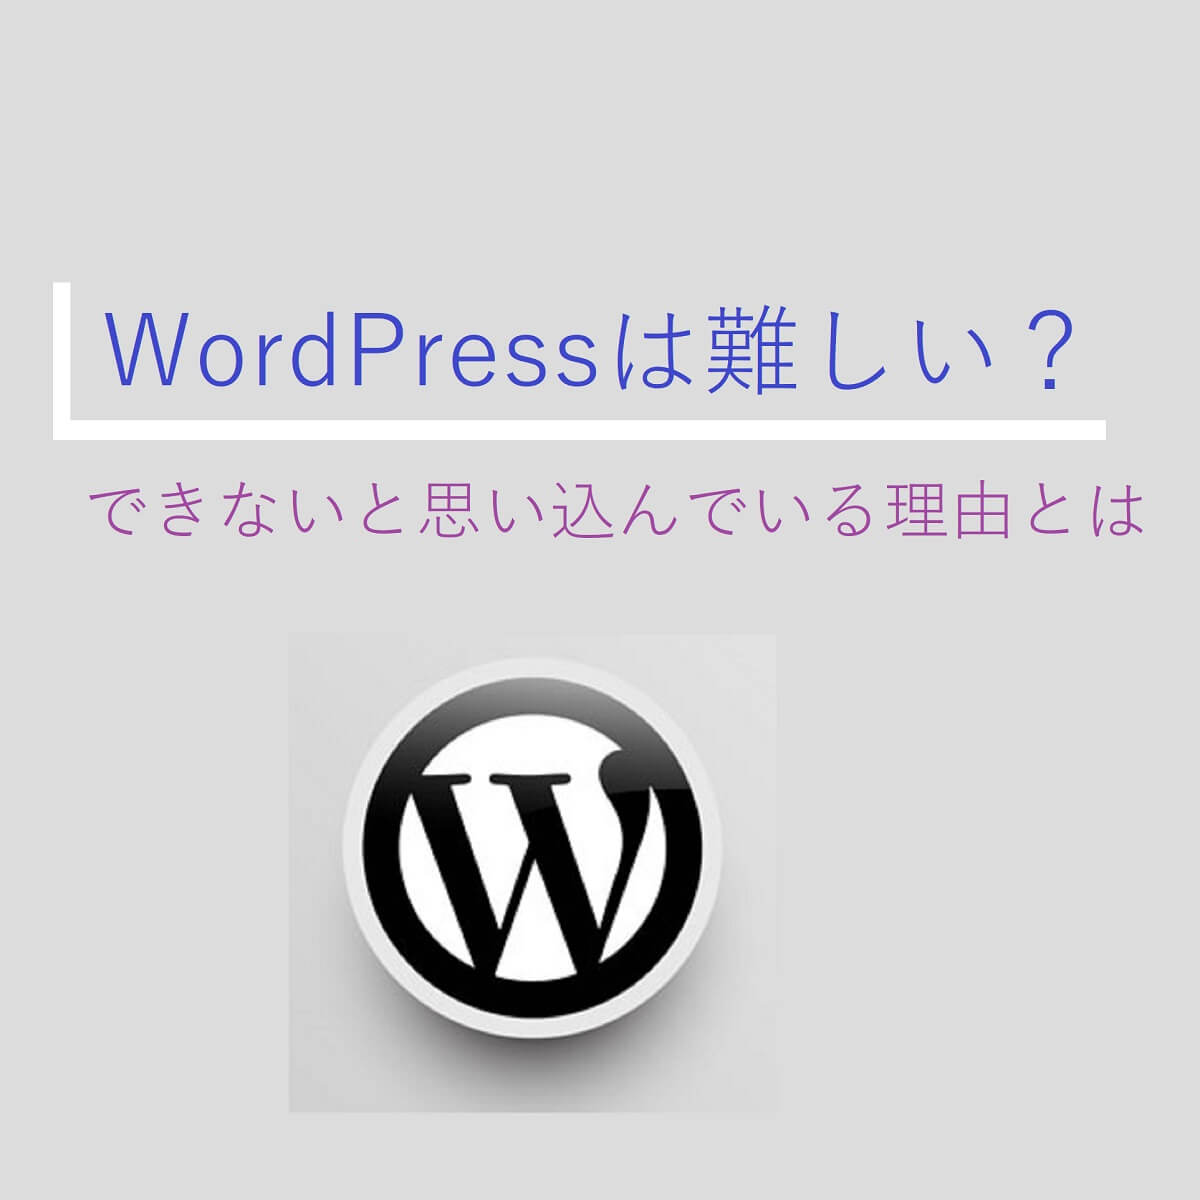 WordPressのロゴ。「WordPressは難しい?できないと思い込んでいる理由とは?」というタイトルが入っている。